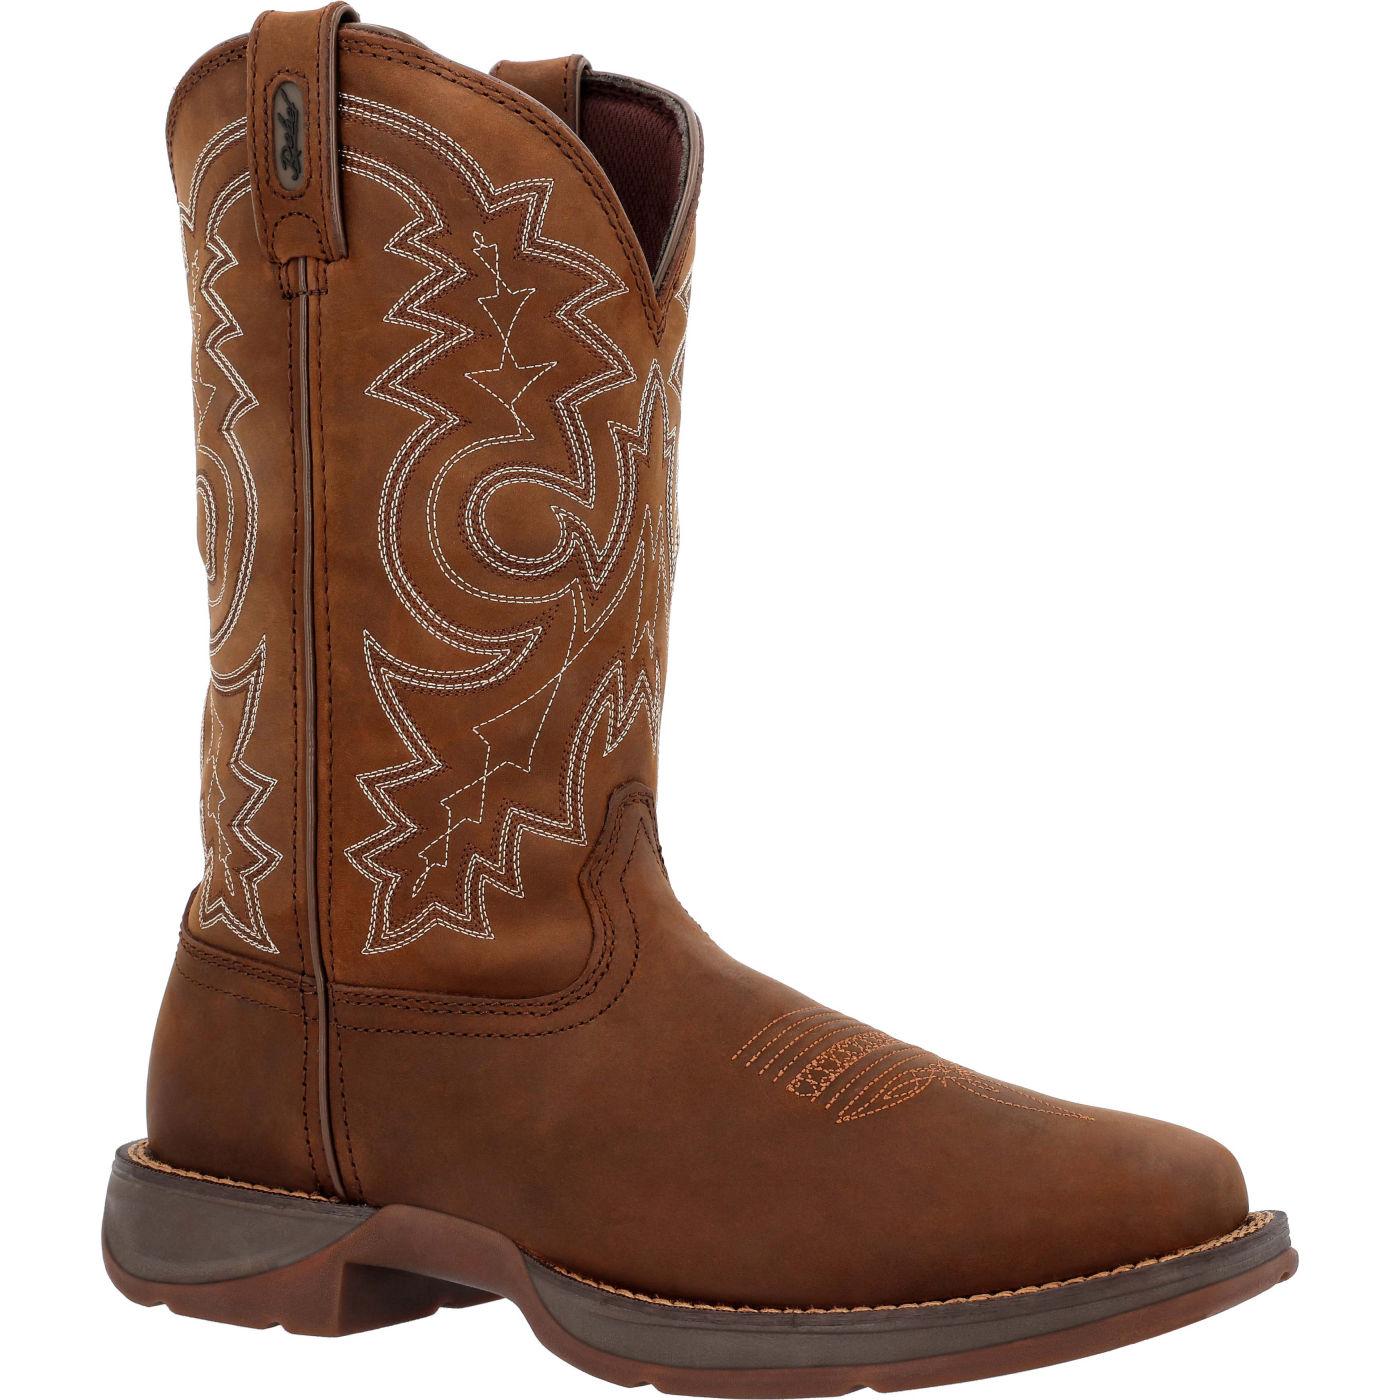 Rebel By Durango Men S Steel Toe Western Work Boots Db4343